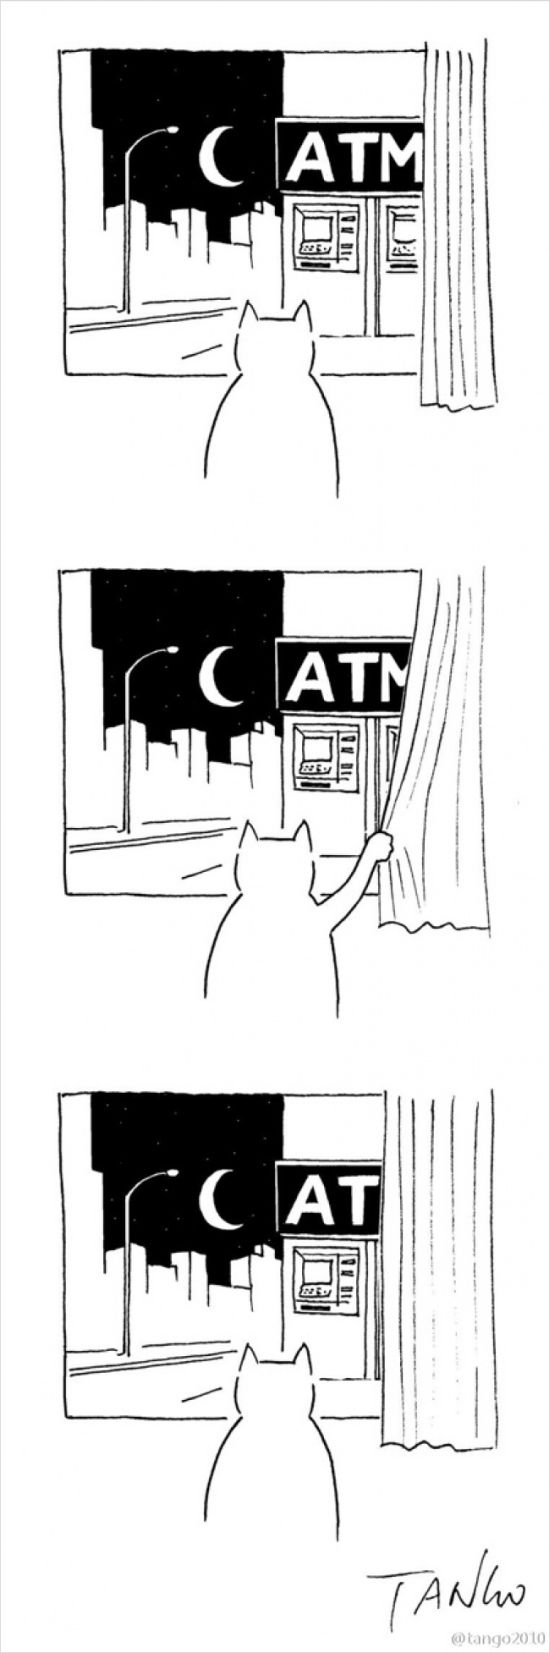 Smart Cartoons By Tango (21 pics)